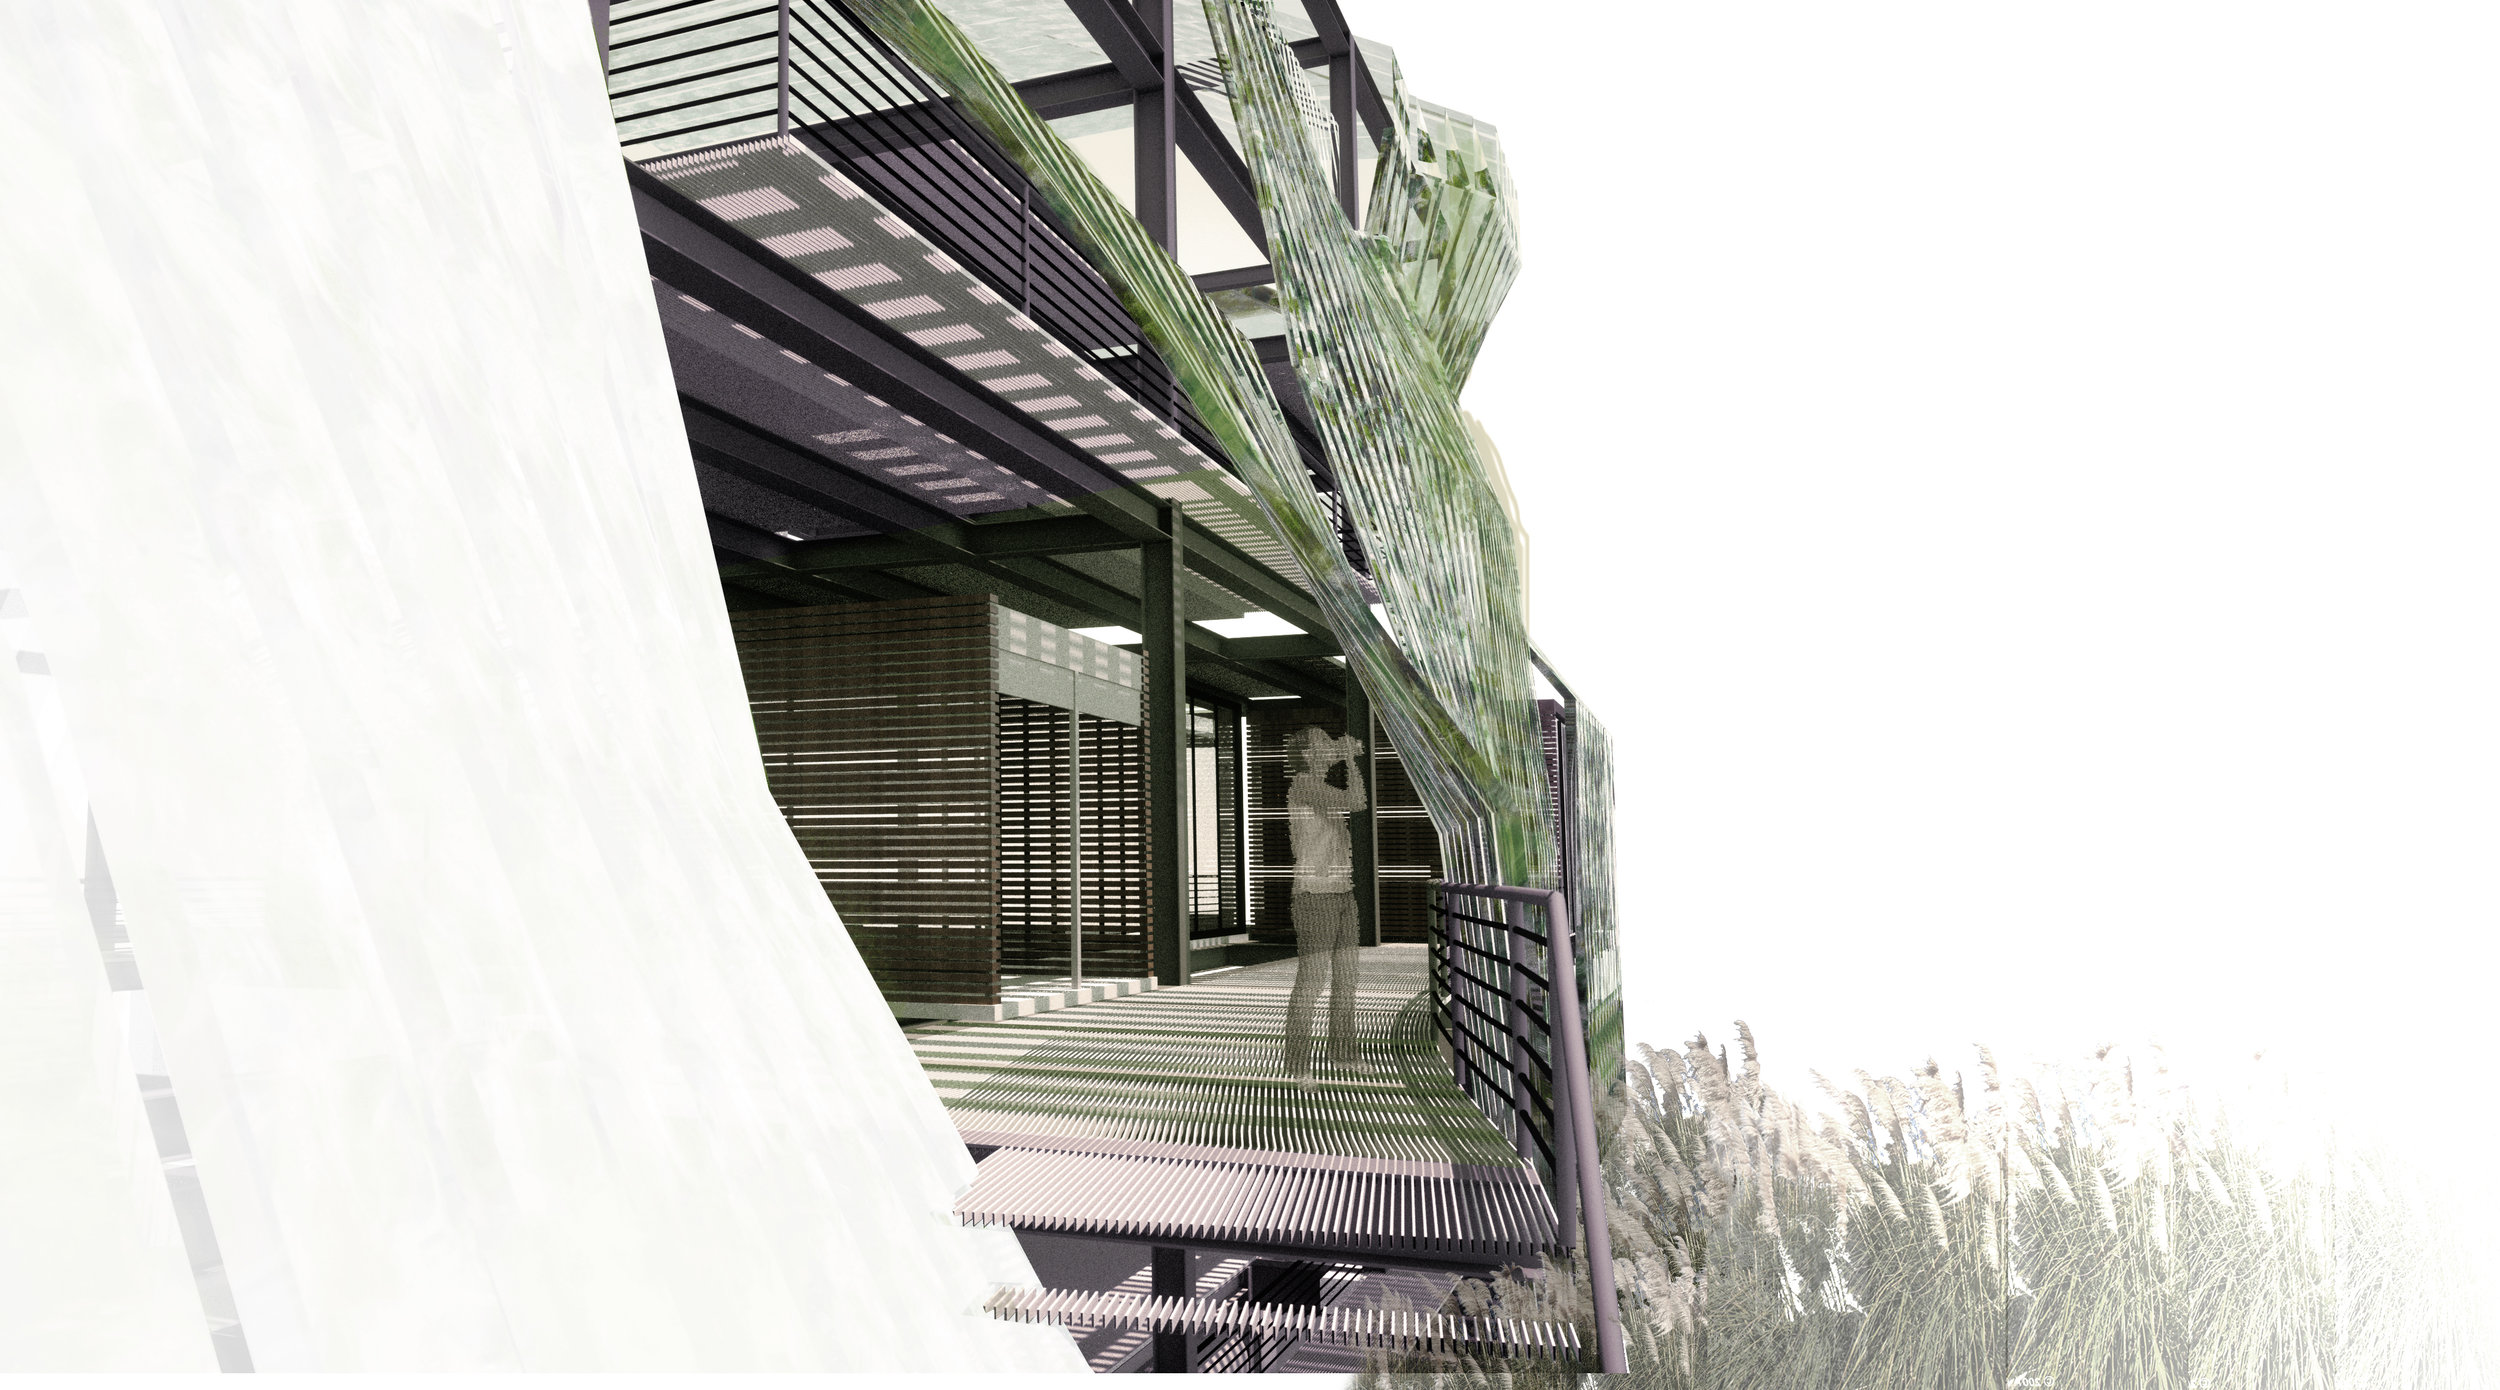 green-clouds-office-commercial-building-enter-render-optimistic.jpg